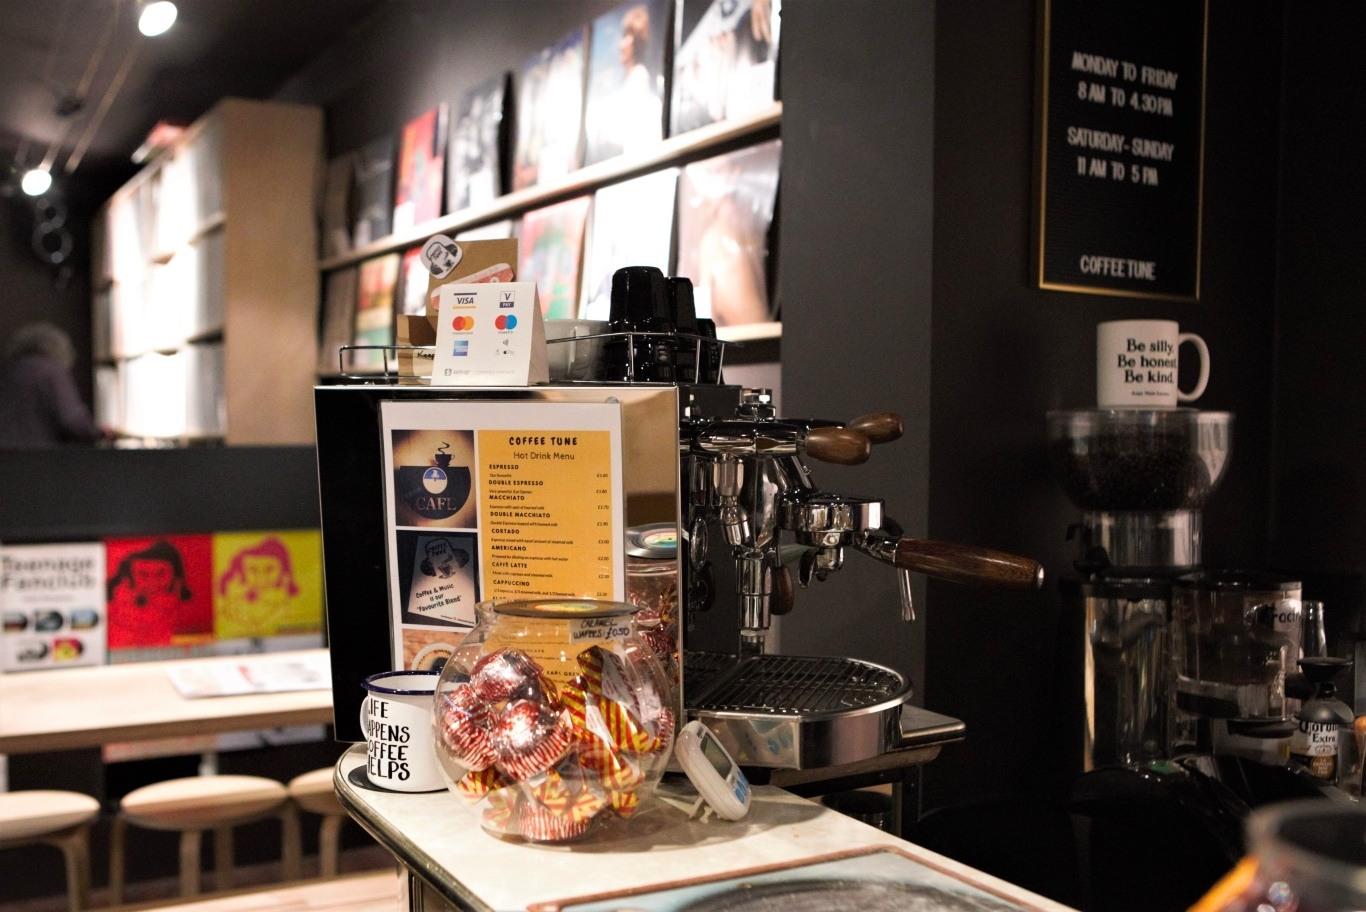 coffee machine and sweets